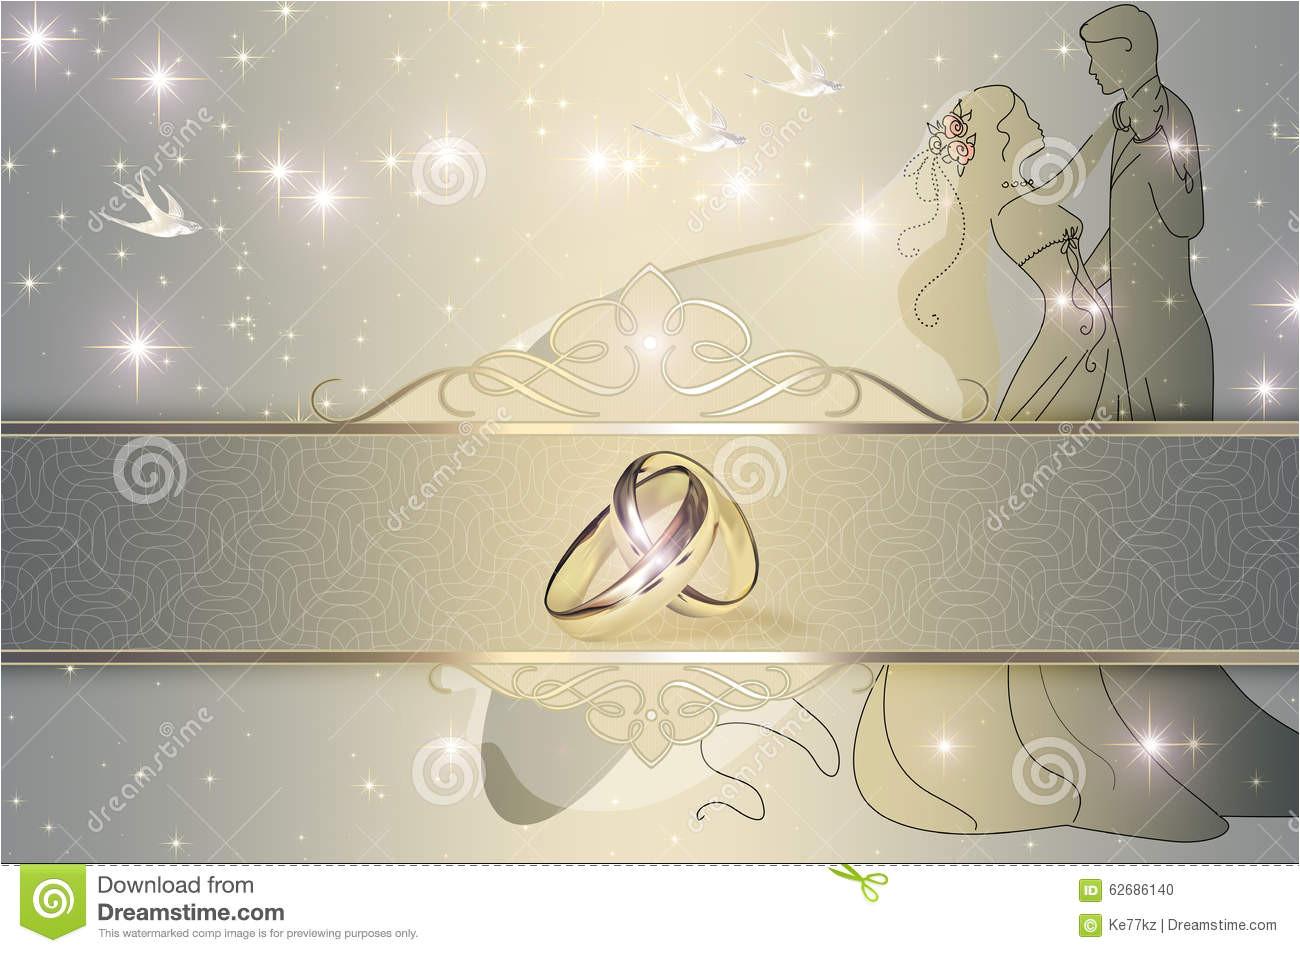 wedding invitation card design decorative background gold rings template 62686140 jpg